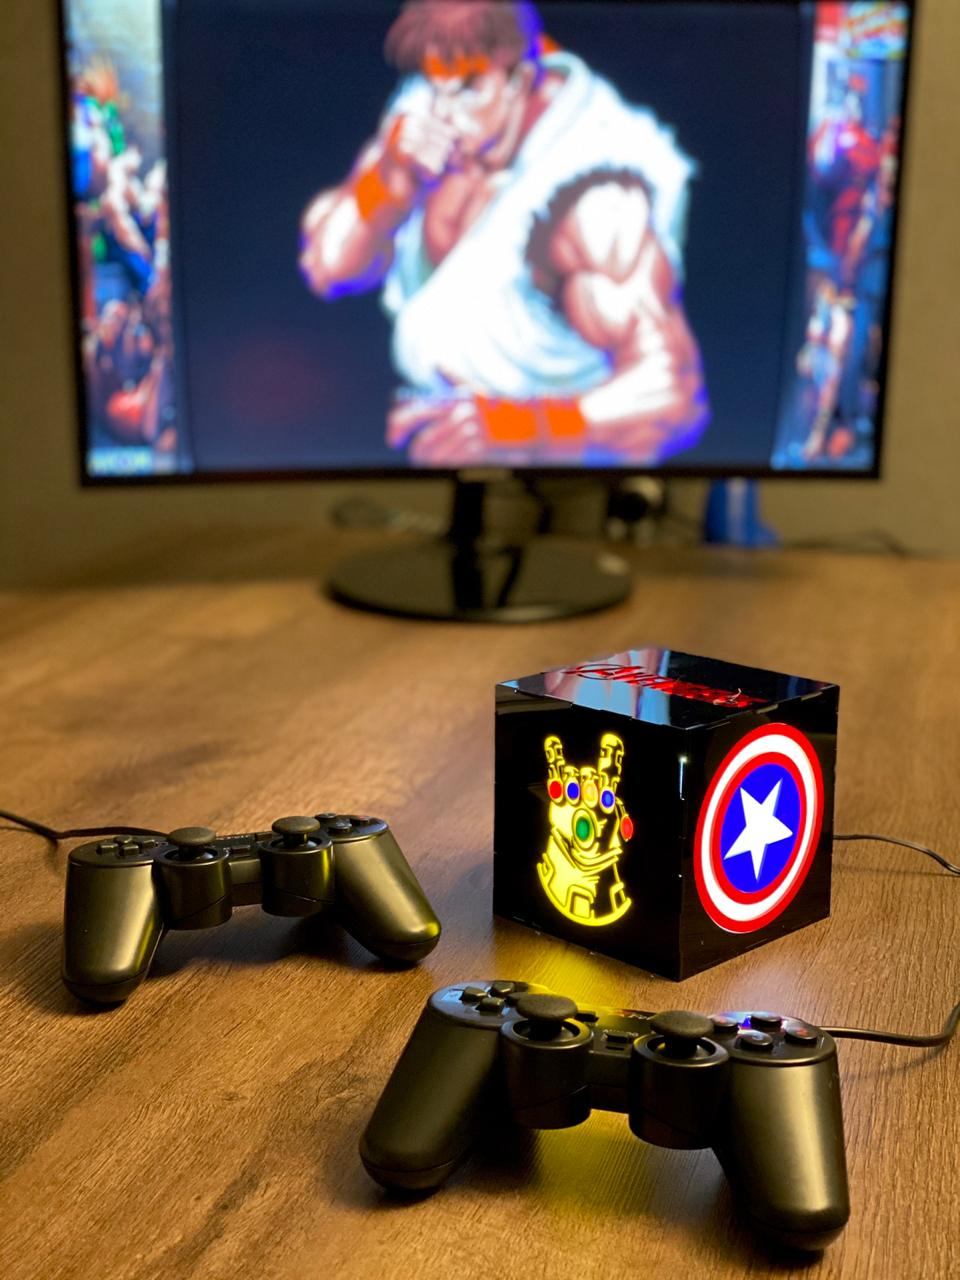 Cubo Retrô Box Vingadores (Avengers) Fliperama Arcade Game (20000 Jogos) PlayStation/Nintendo/SNES/MegaDrive/Sega Saturn